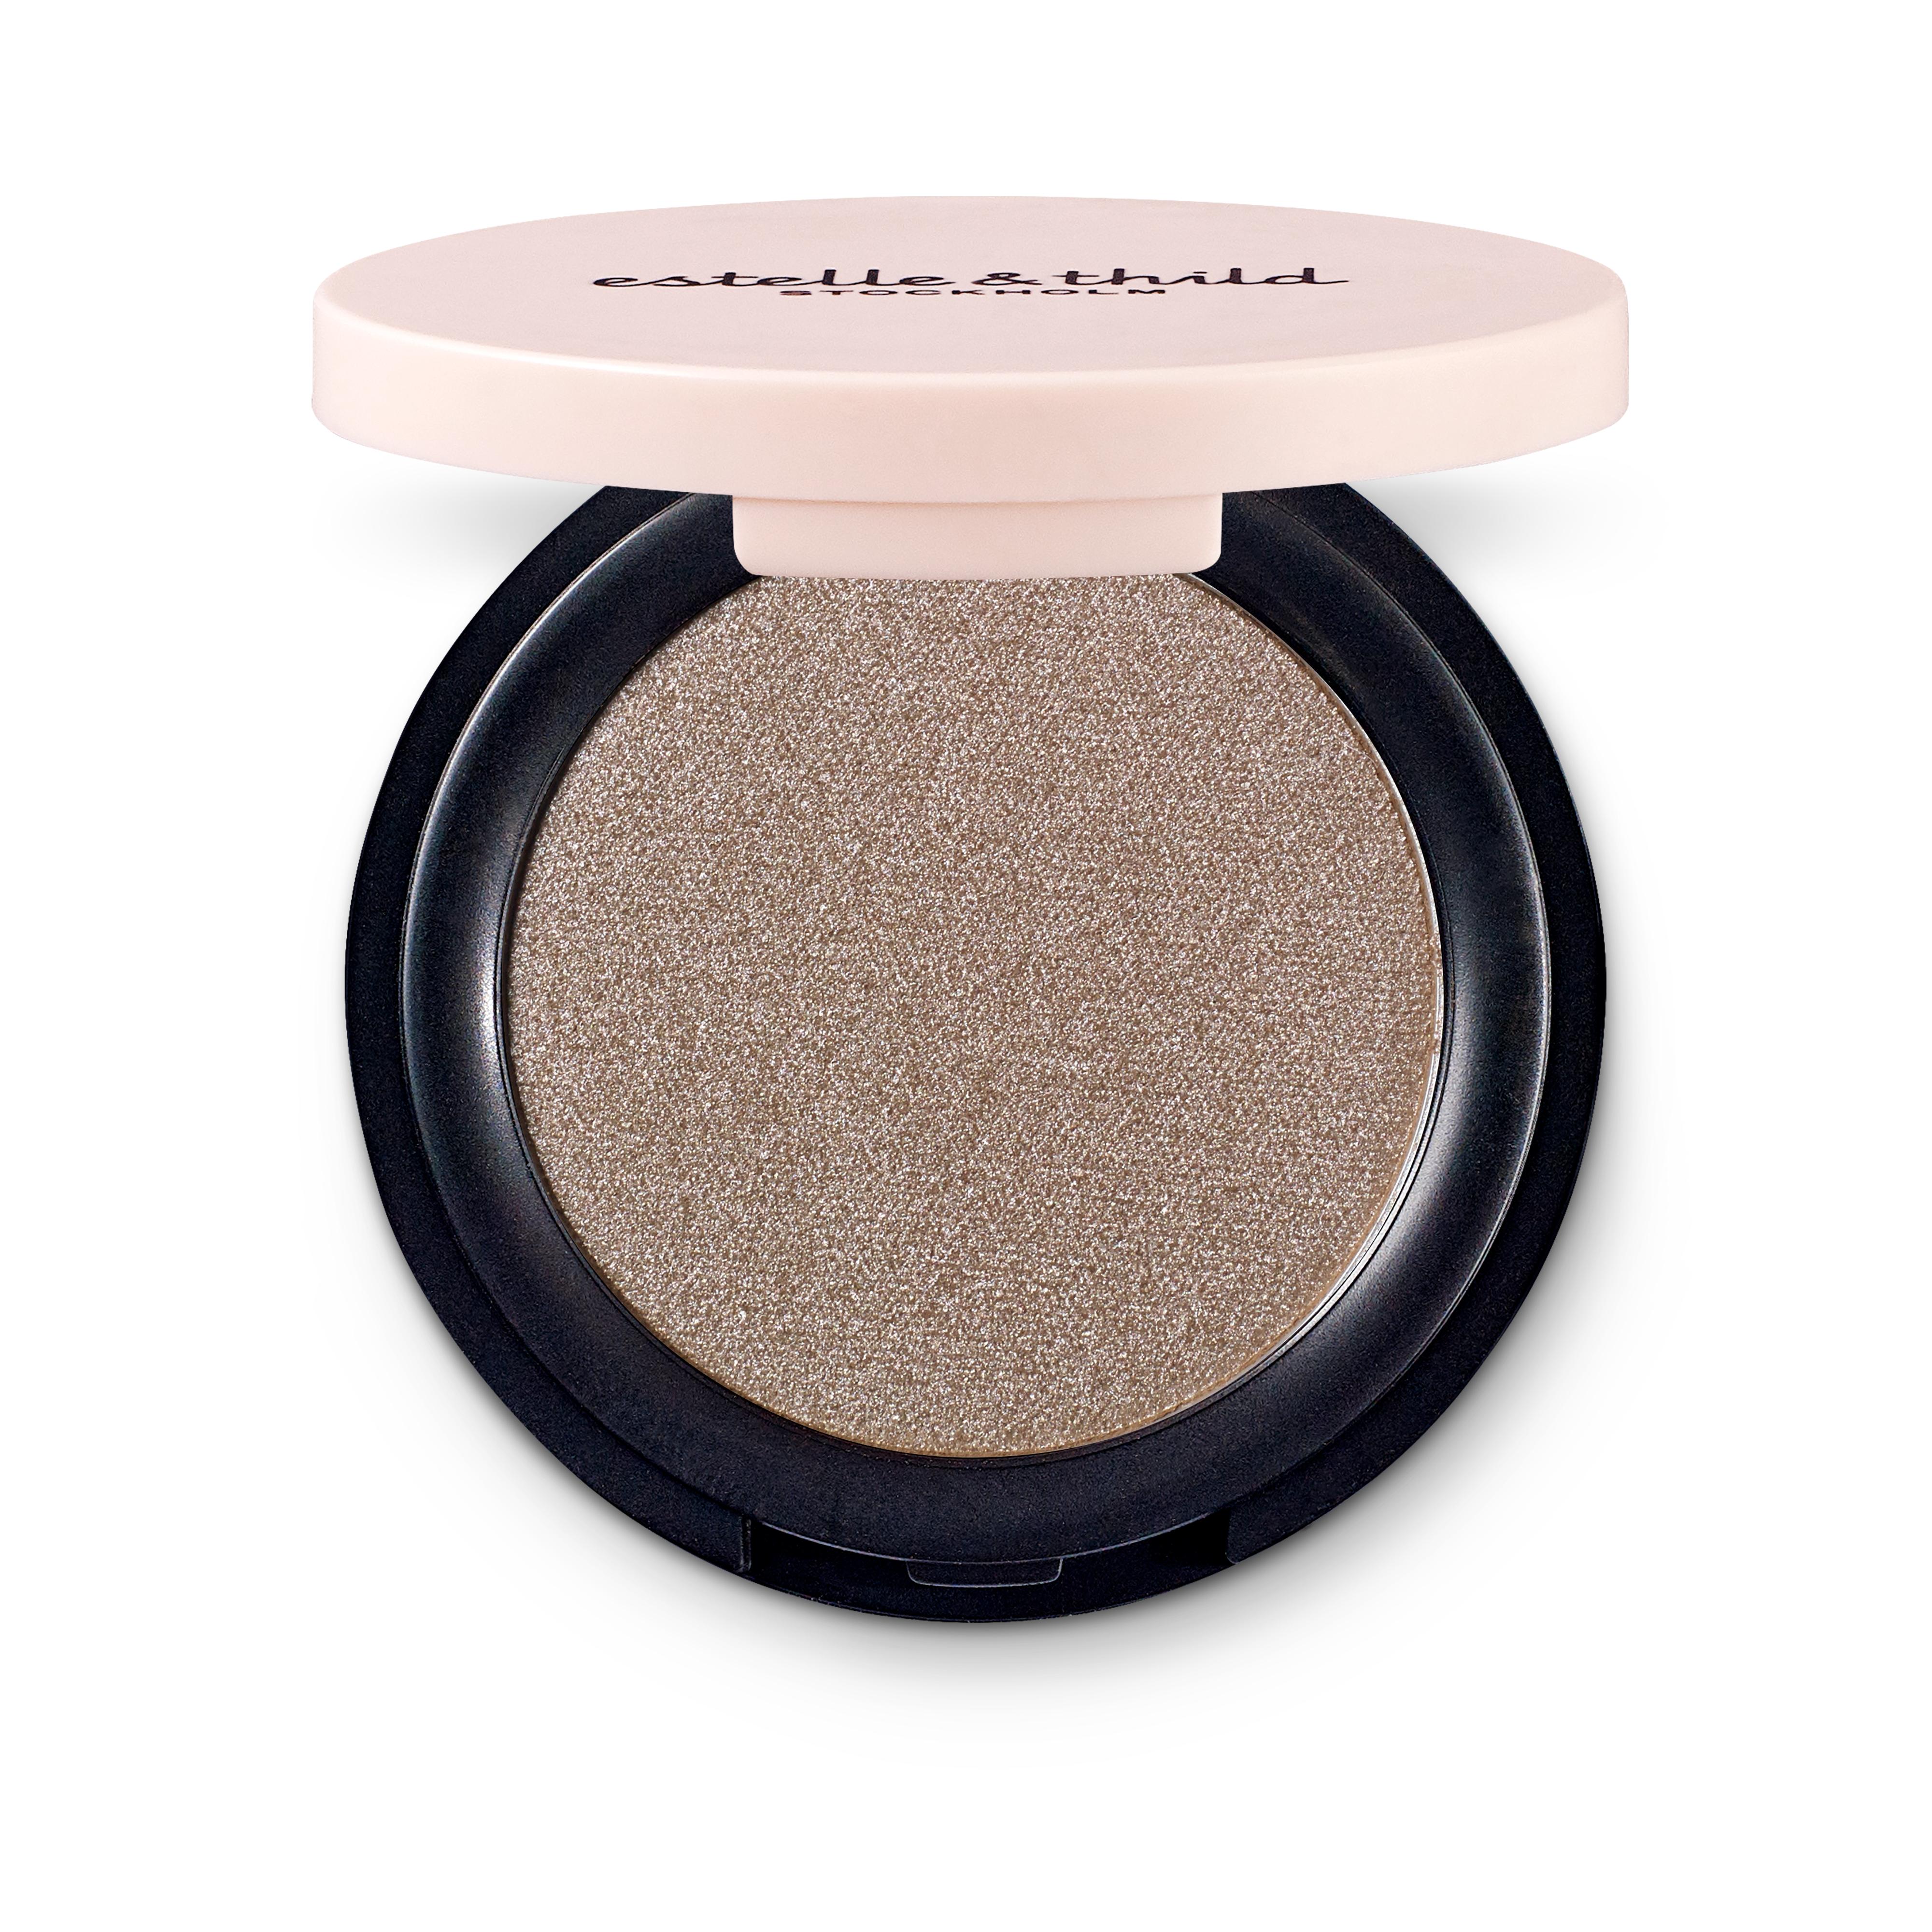 BioMineral Silky Eyeshadow Bare